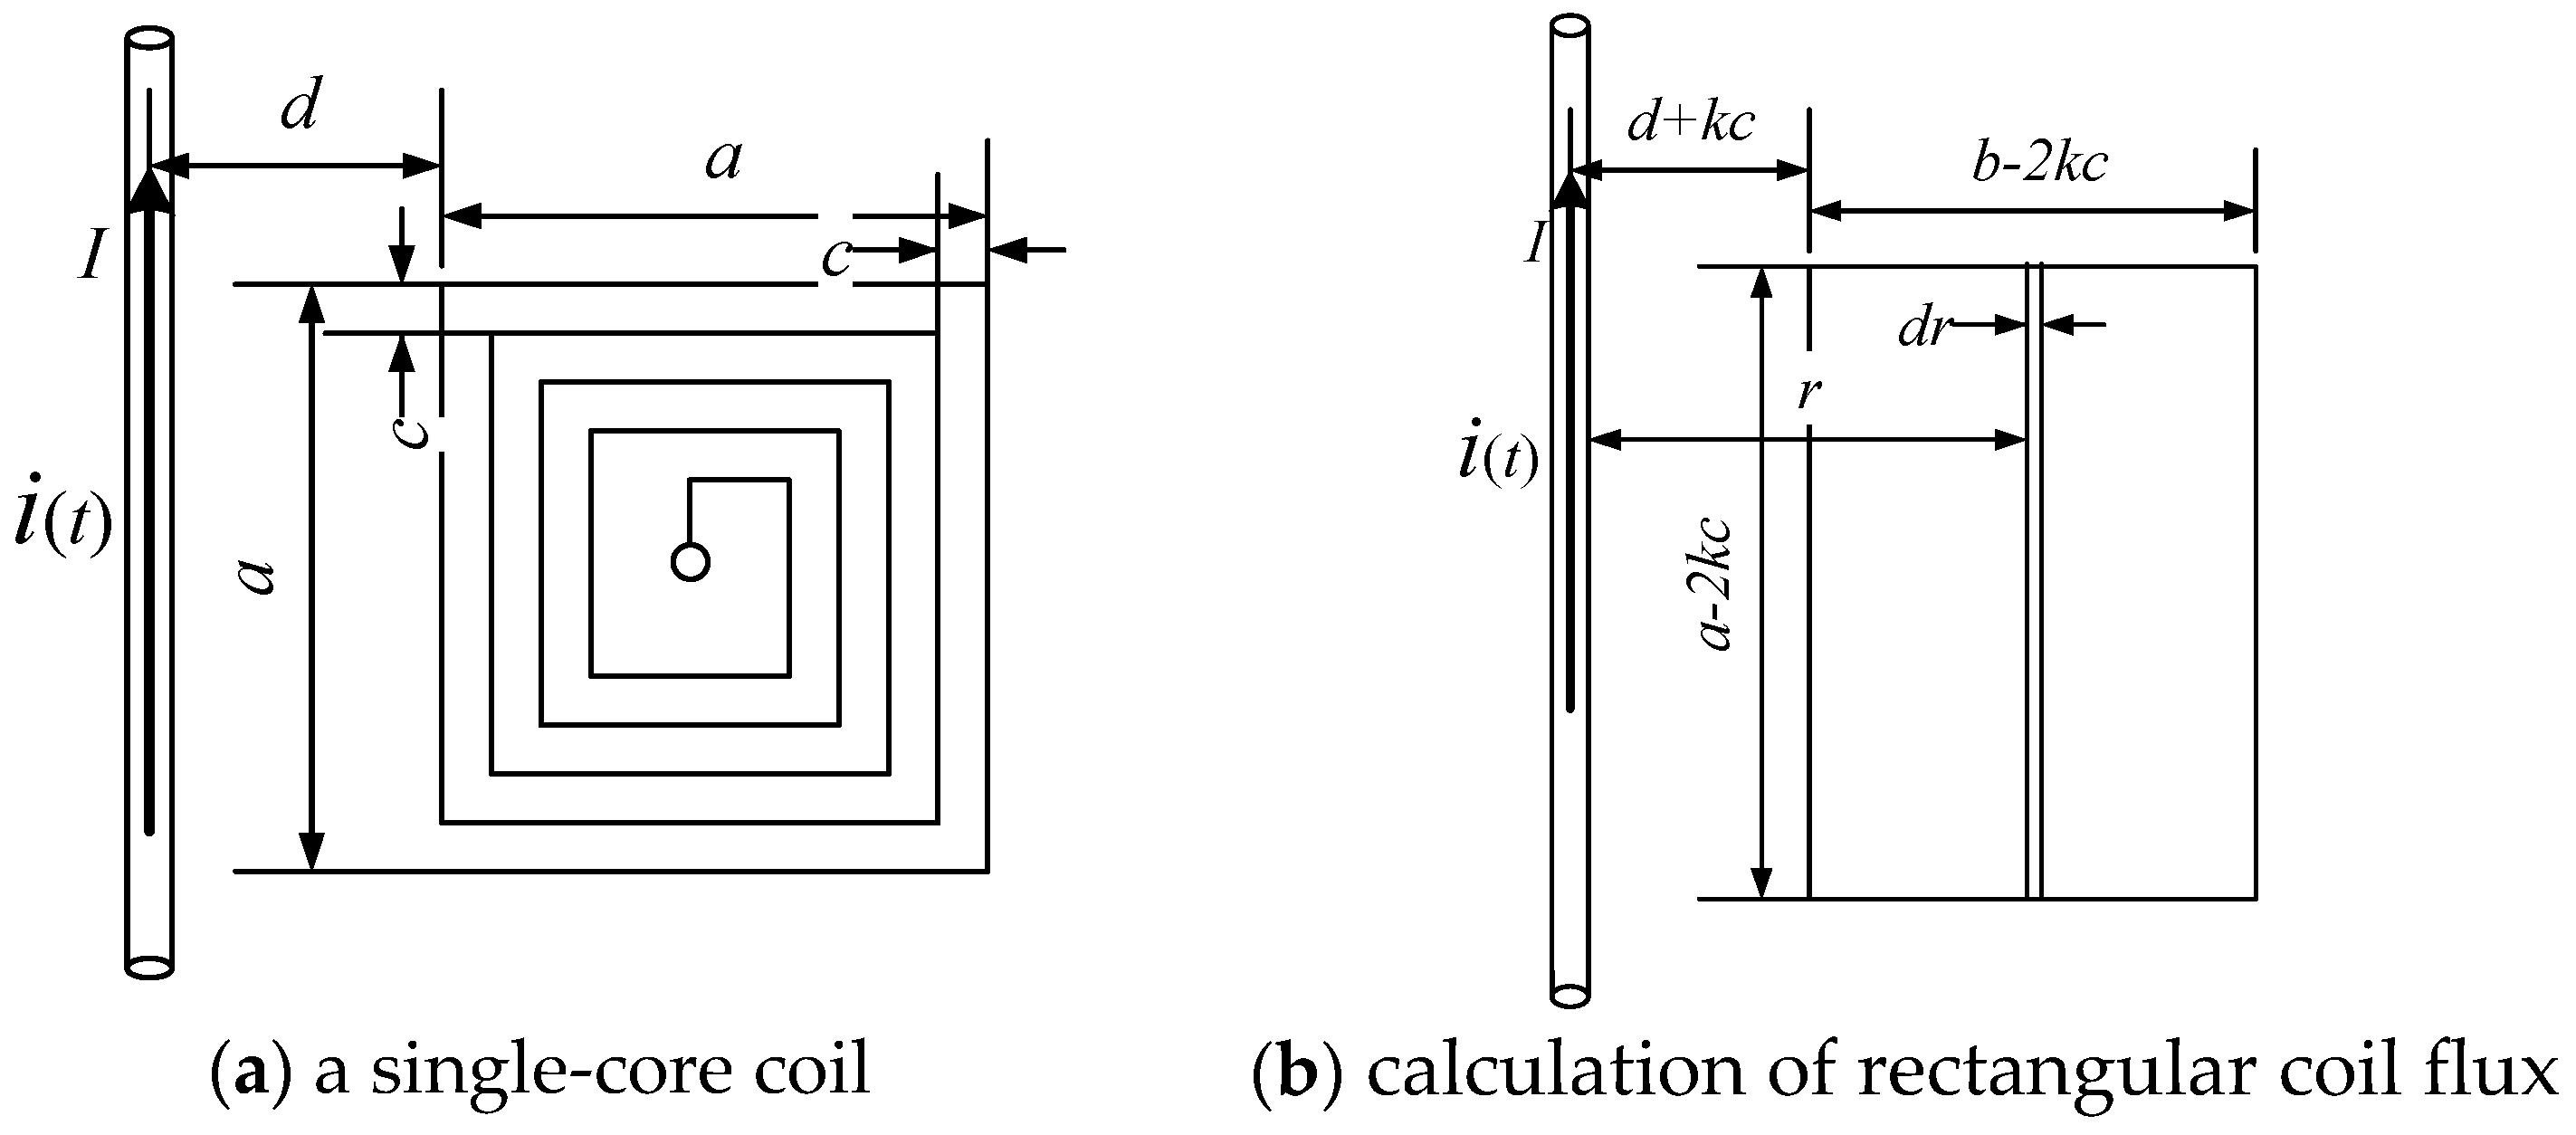 Wiring Diagram Moreover On Wiring Diagram 4afe Car Diagrams 4a